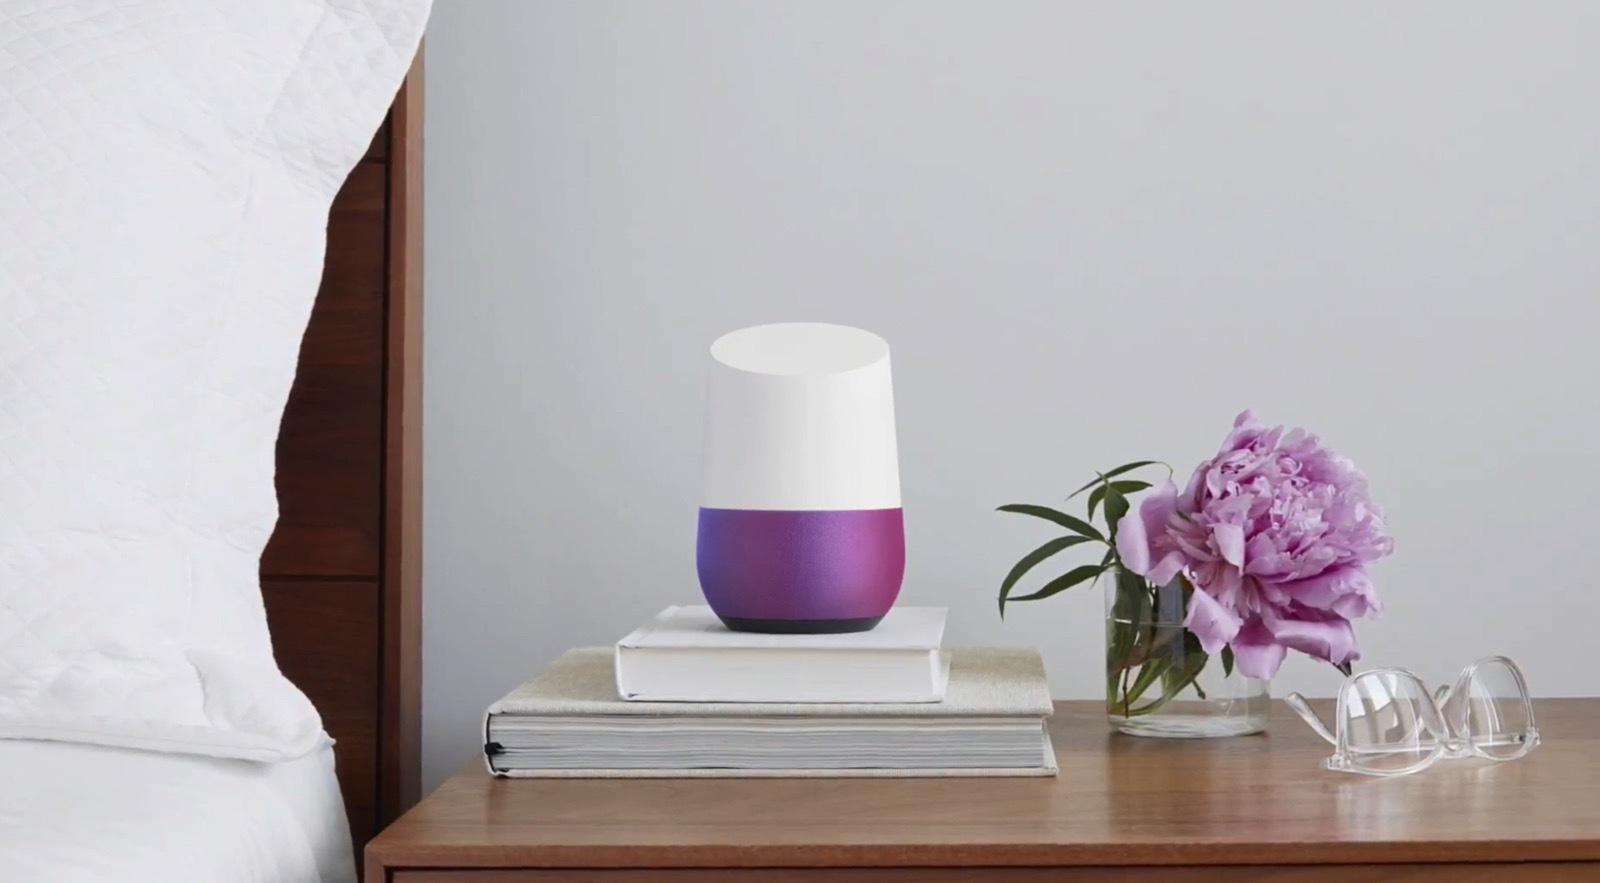 nadchodzi google home mini adna i tania wersja. Black Bedroom Furniture Sets. Home Design Ideas